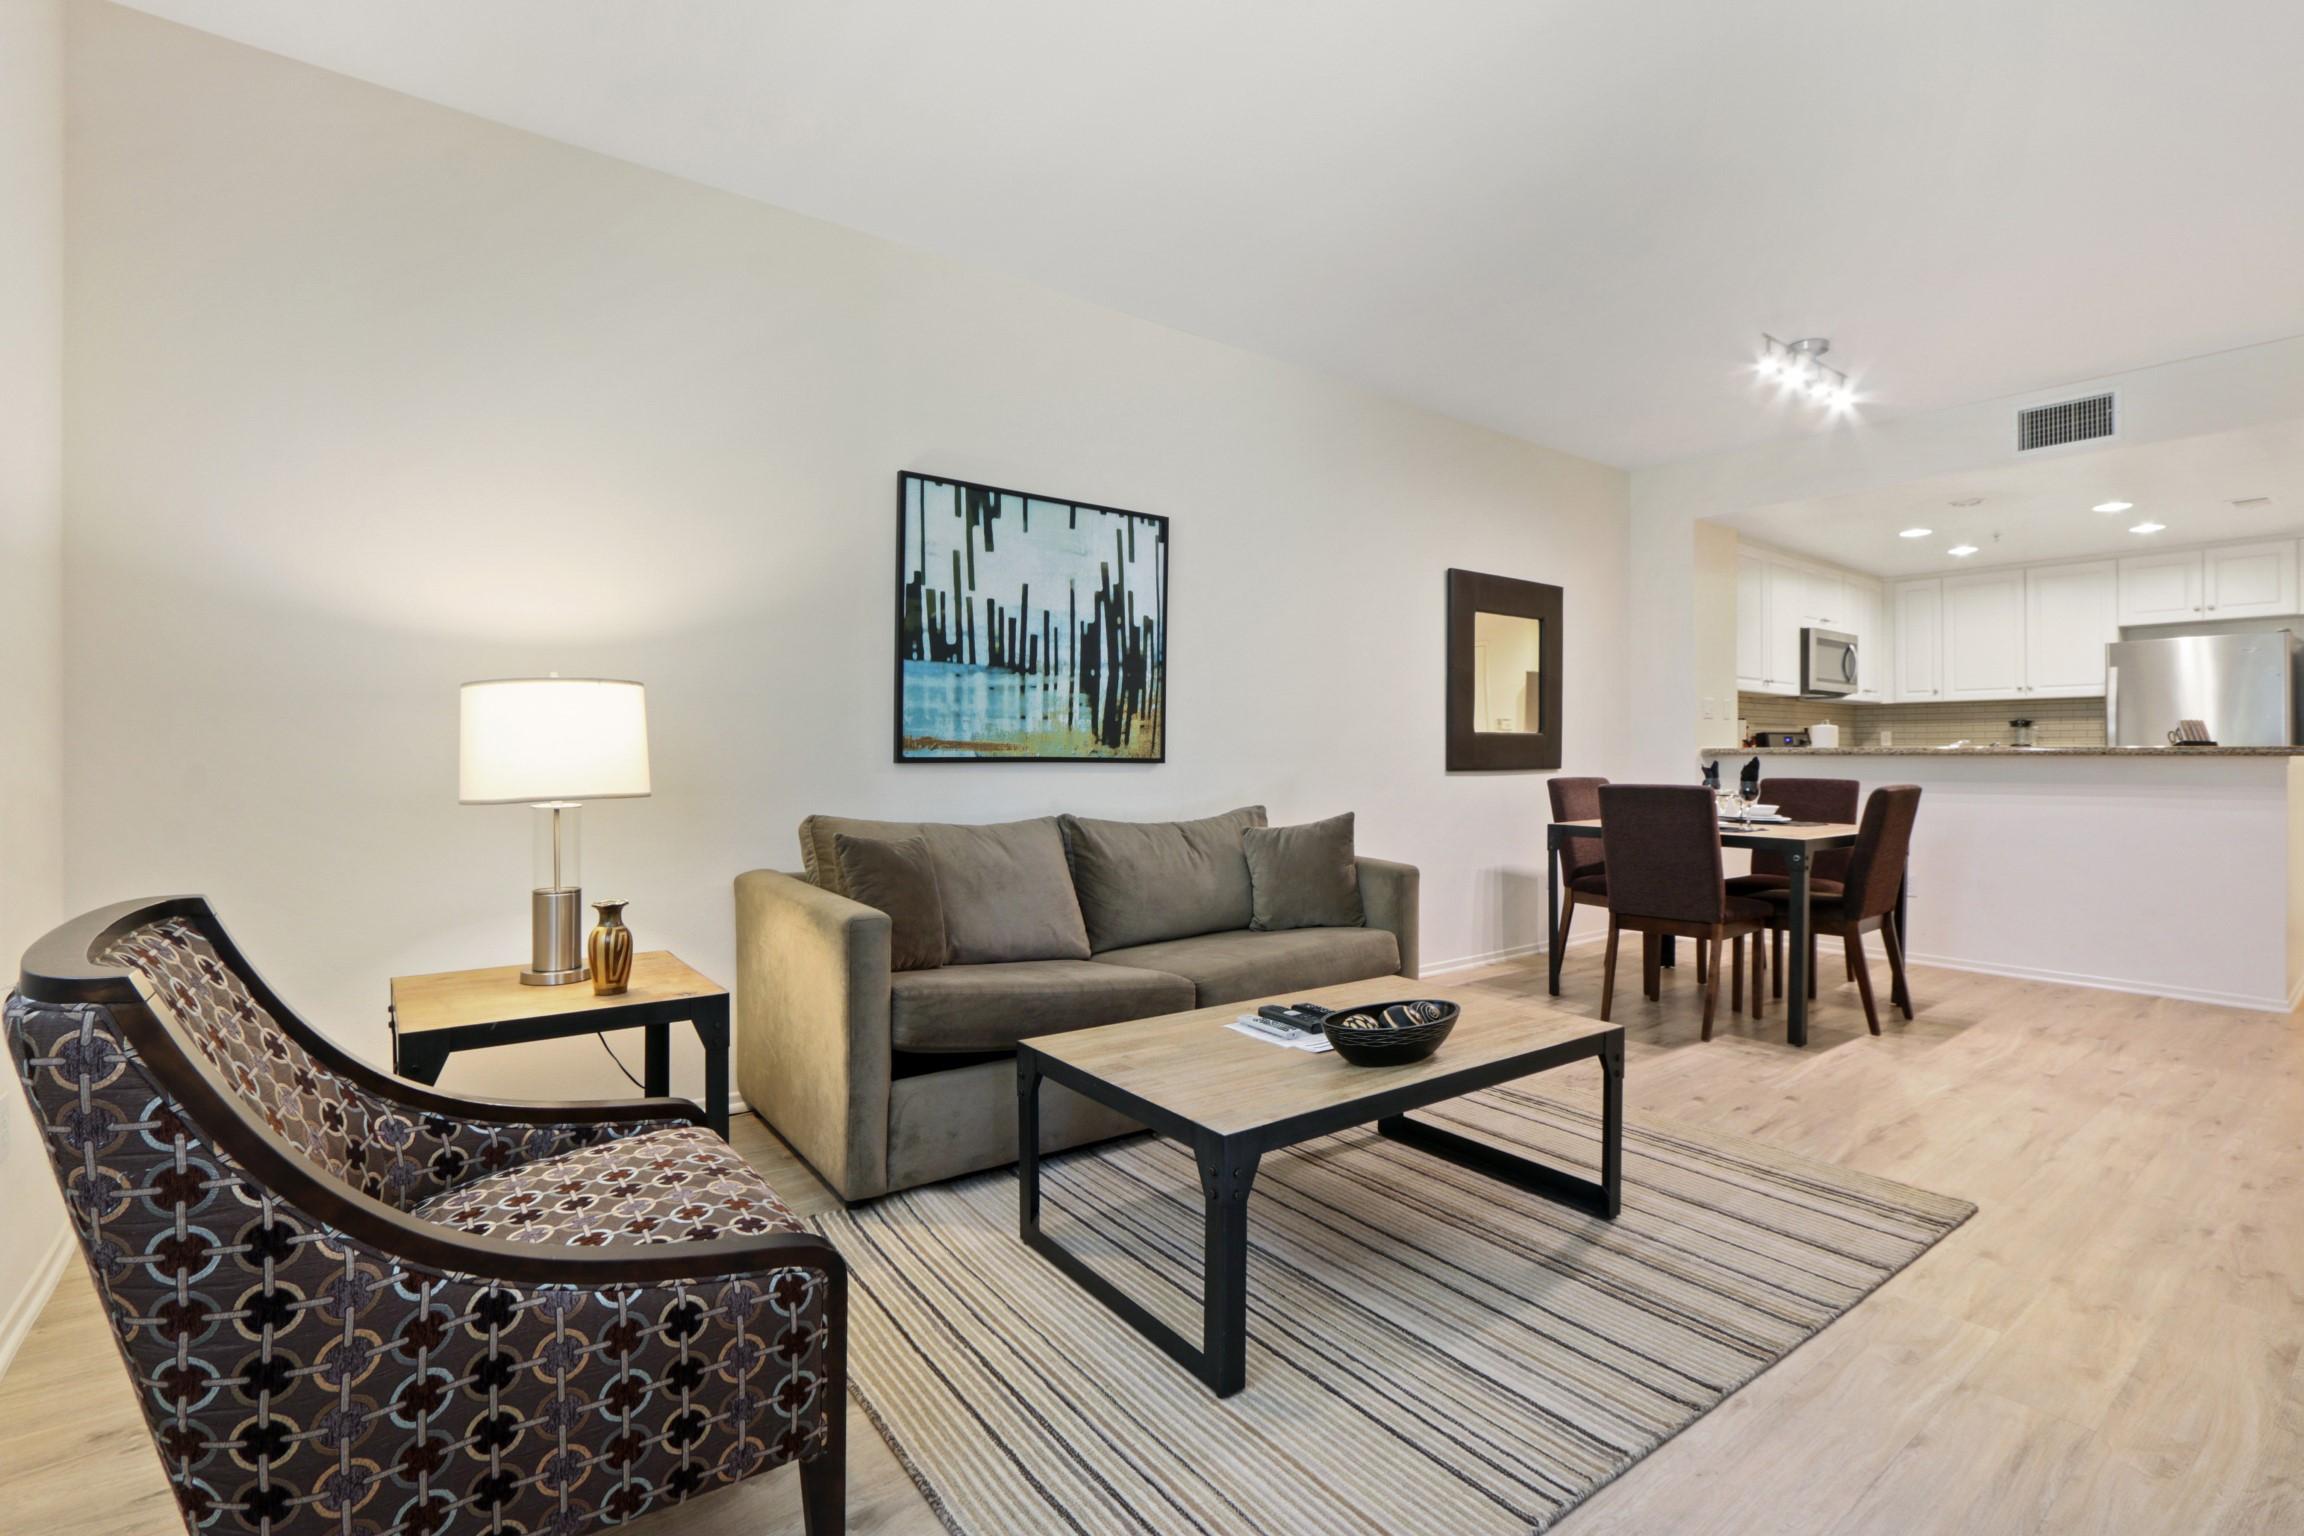 image 7 furnished 1 bedroom Apartment for rent in Irvine, Orange County